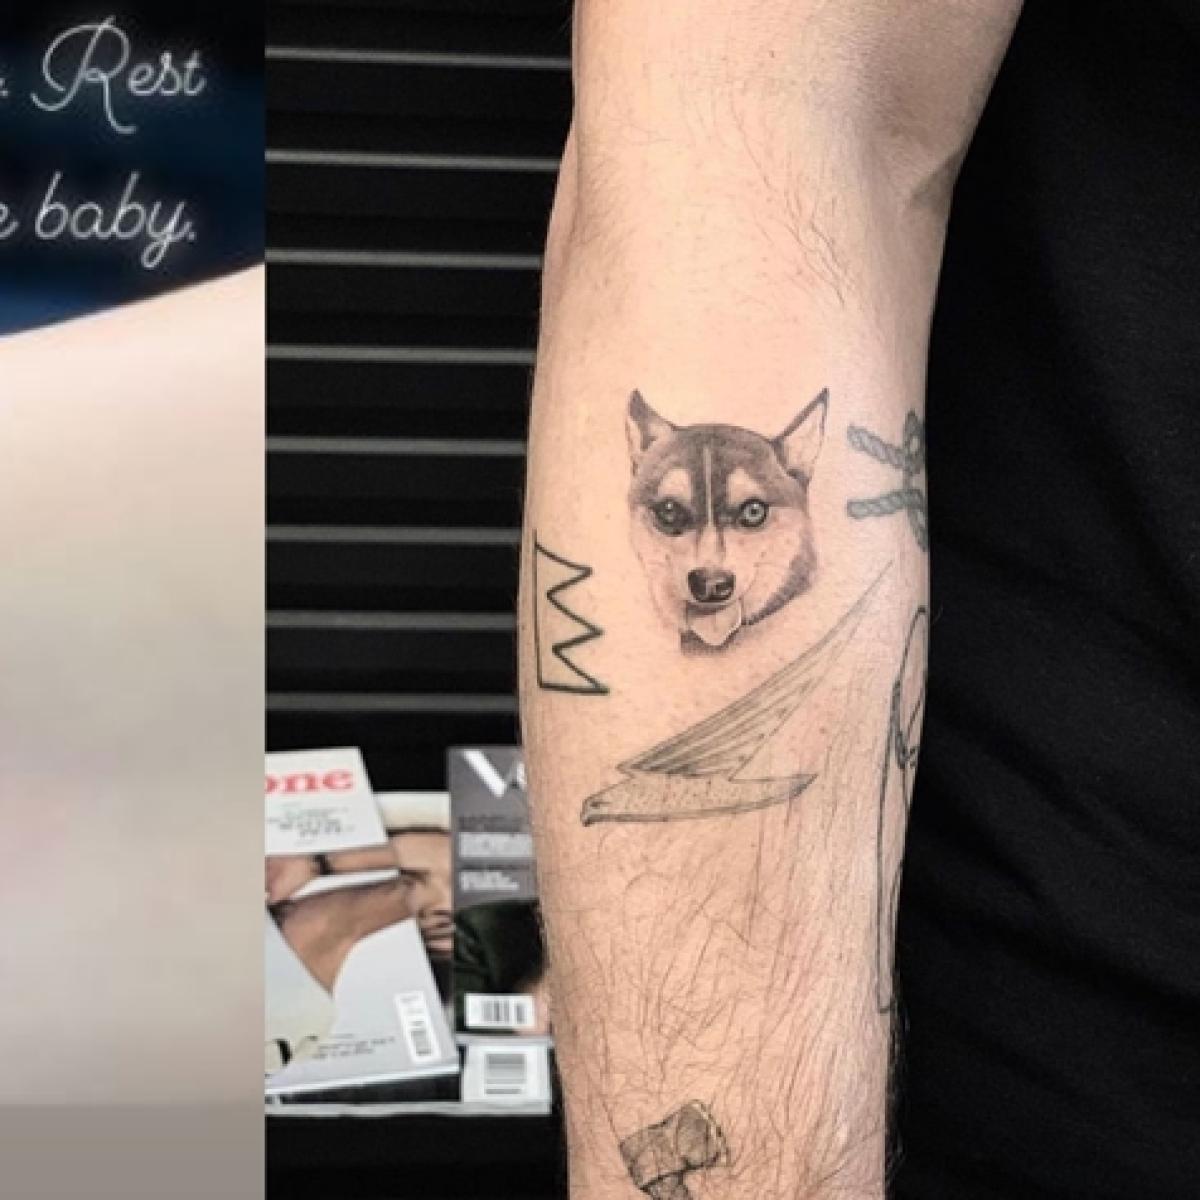 Sophie Turner and Joe Jonas get matching tattoos in memory of their dog Waldo